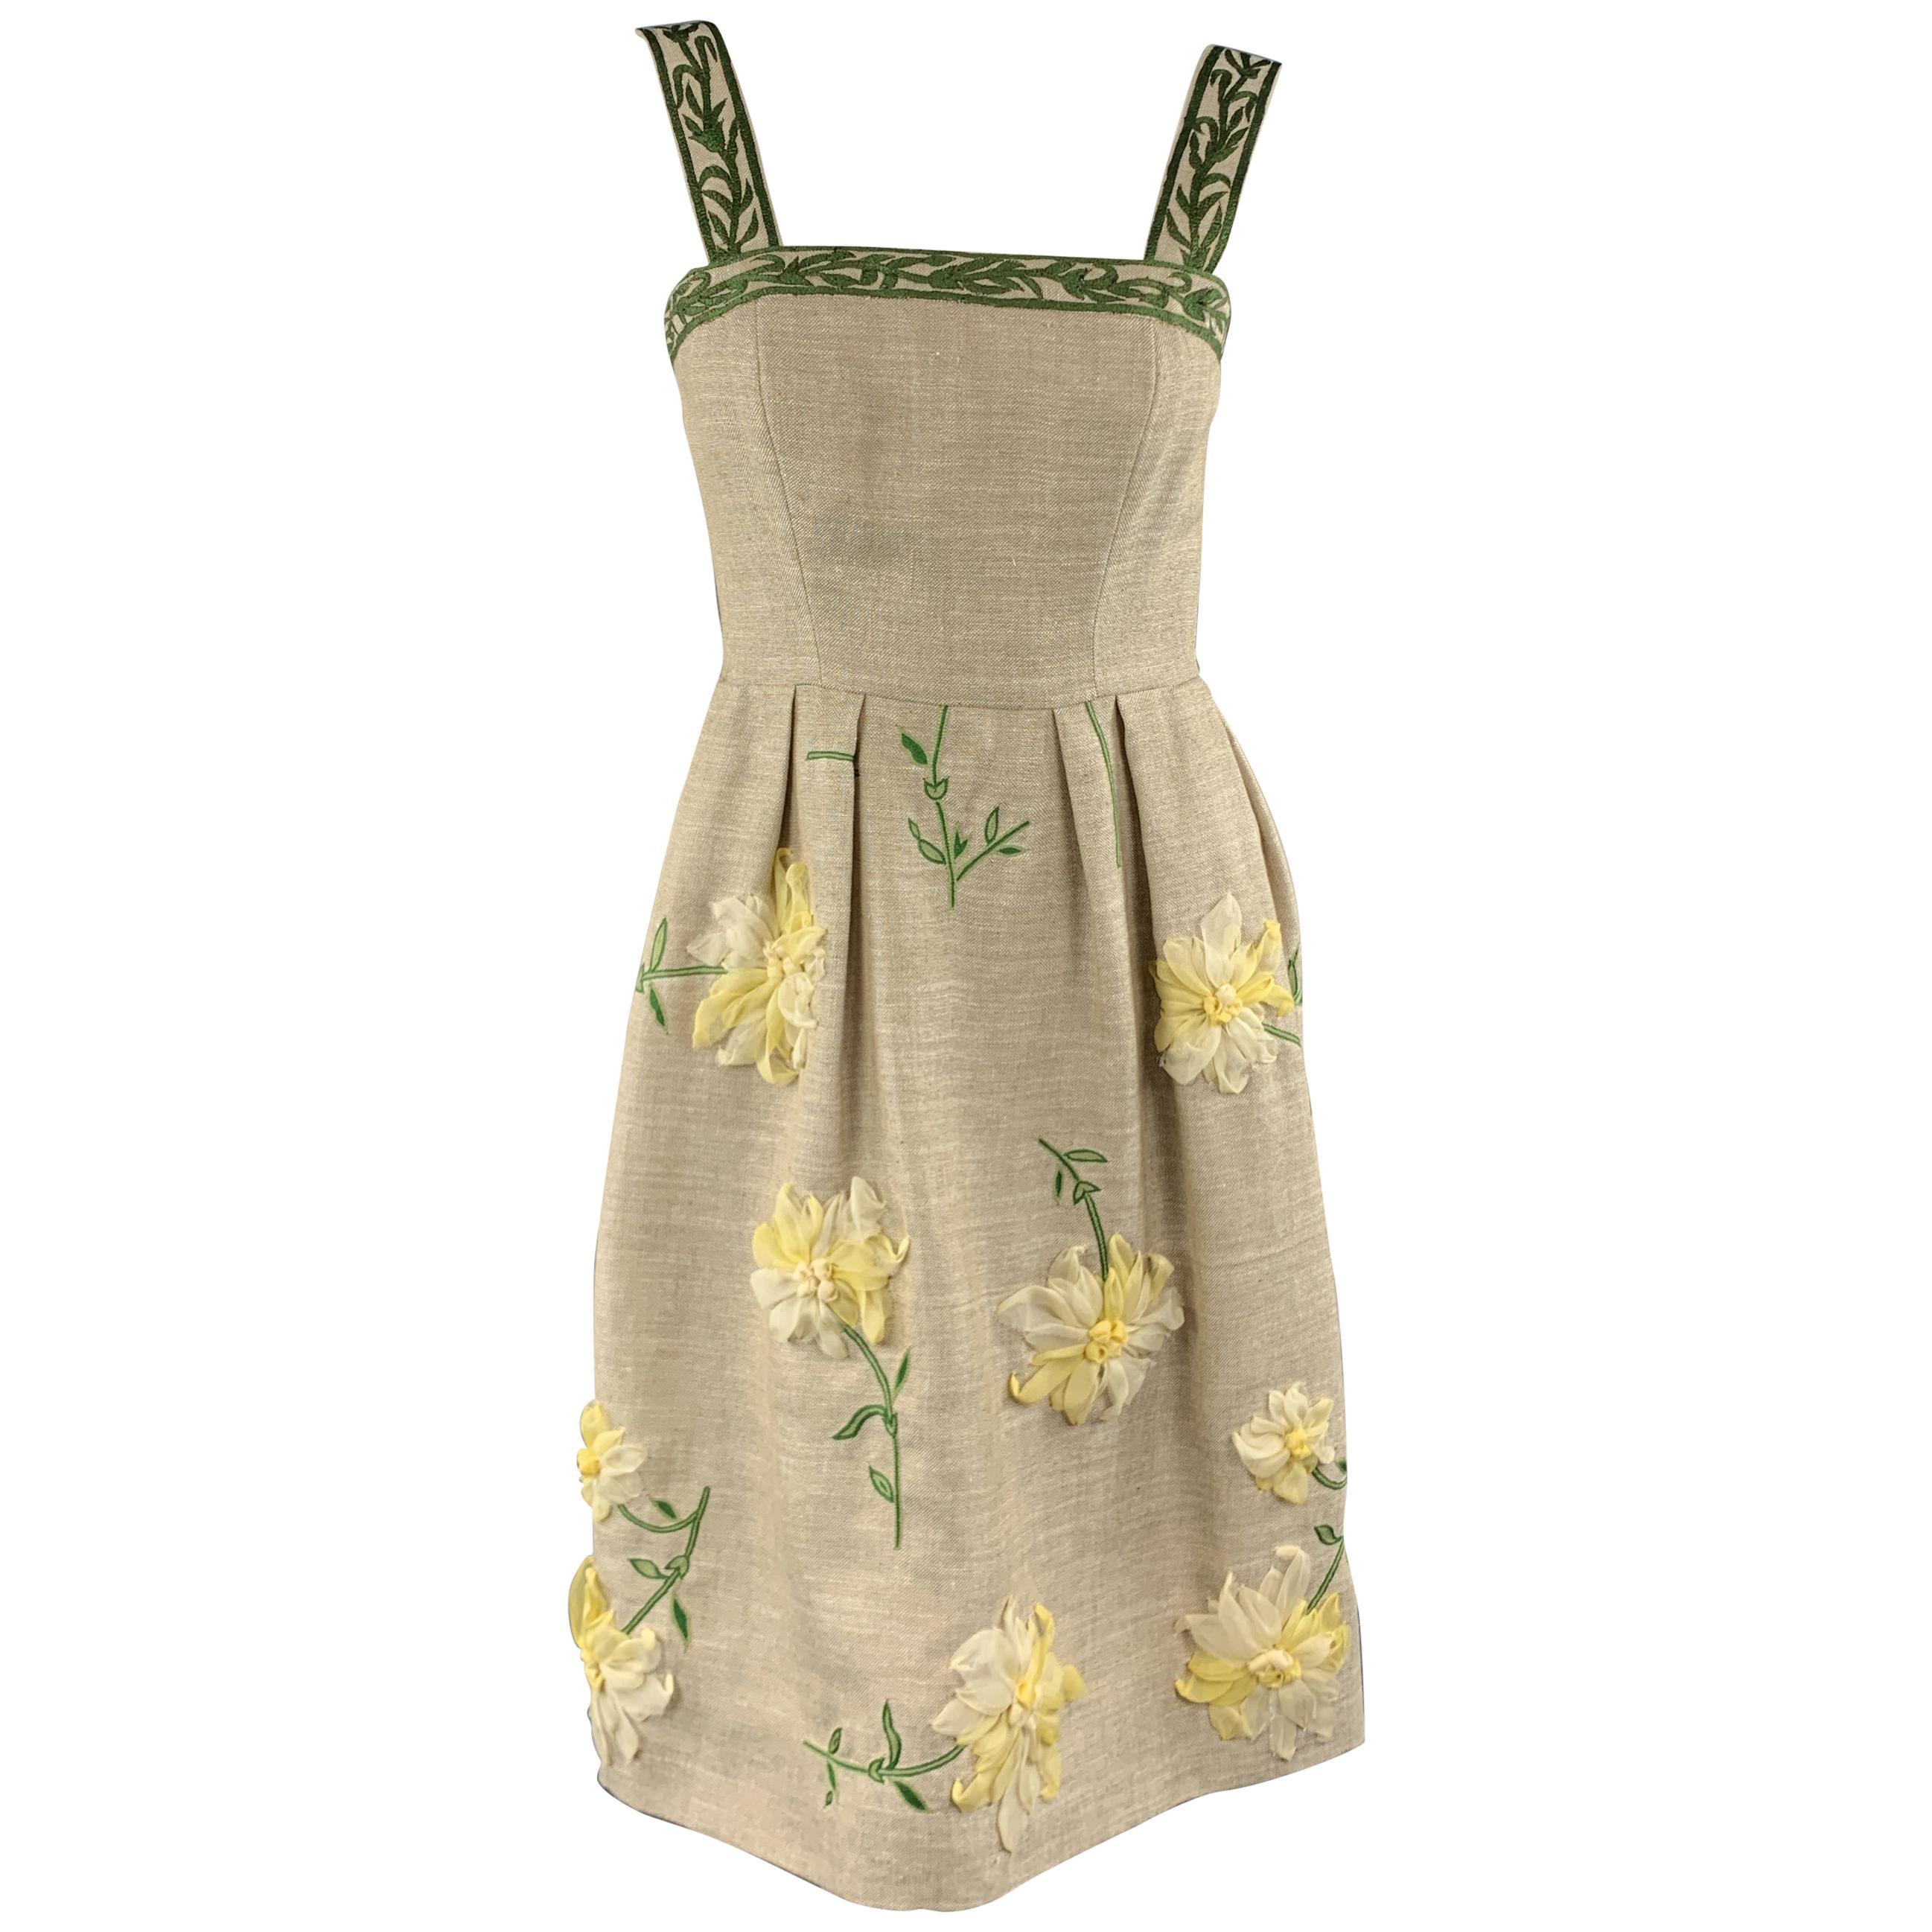 OSCAR DE LA RENTA Size 0 Taupe Woven Yellow Silk Flower Fit Flair Dress